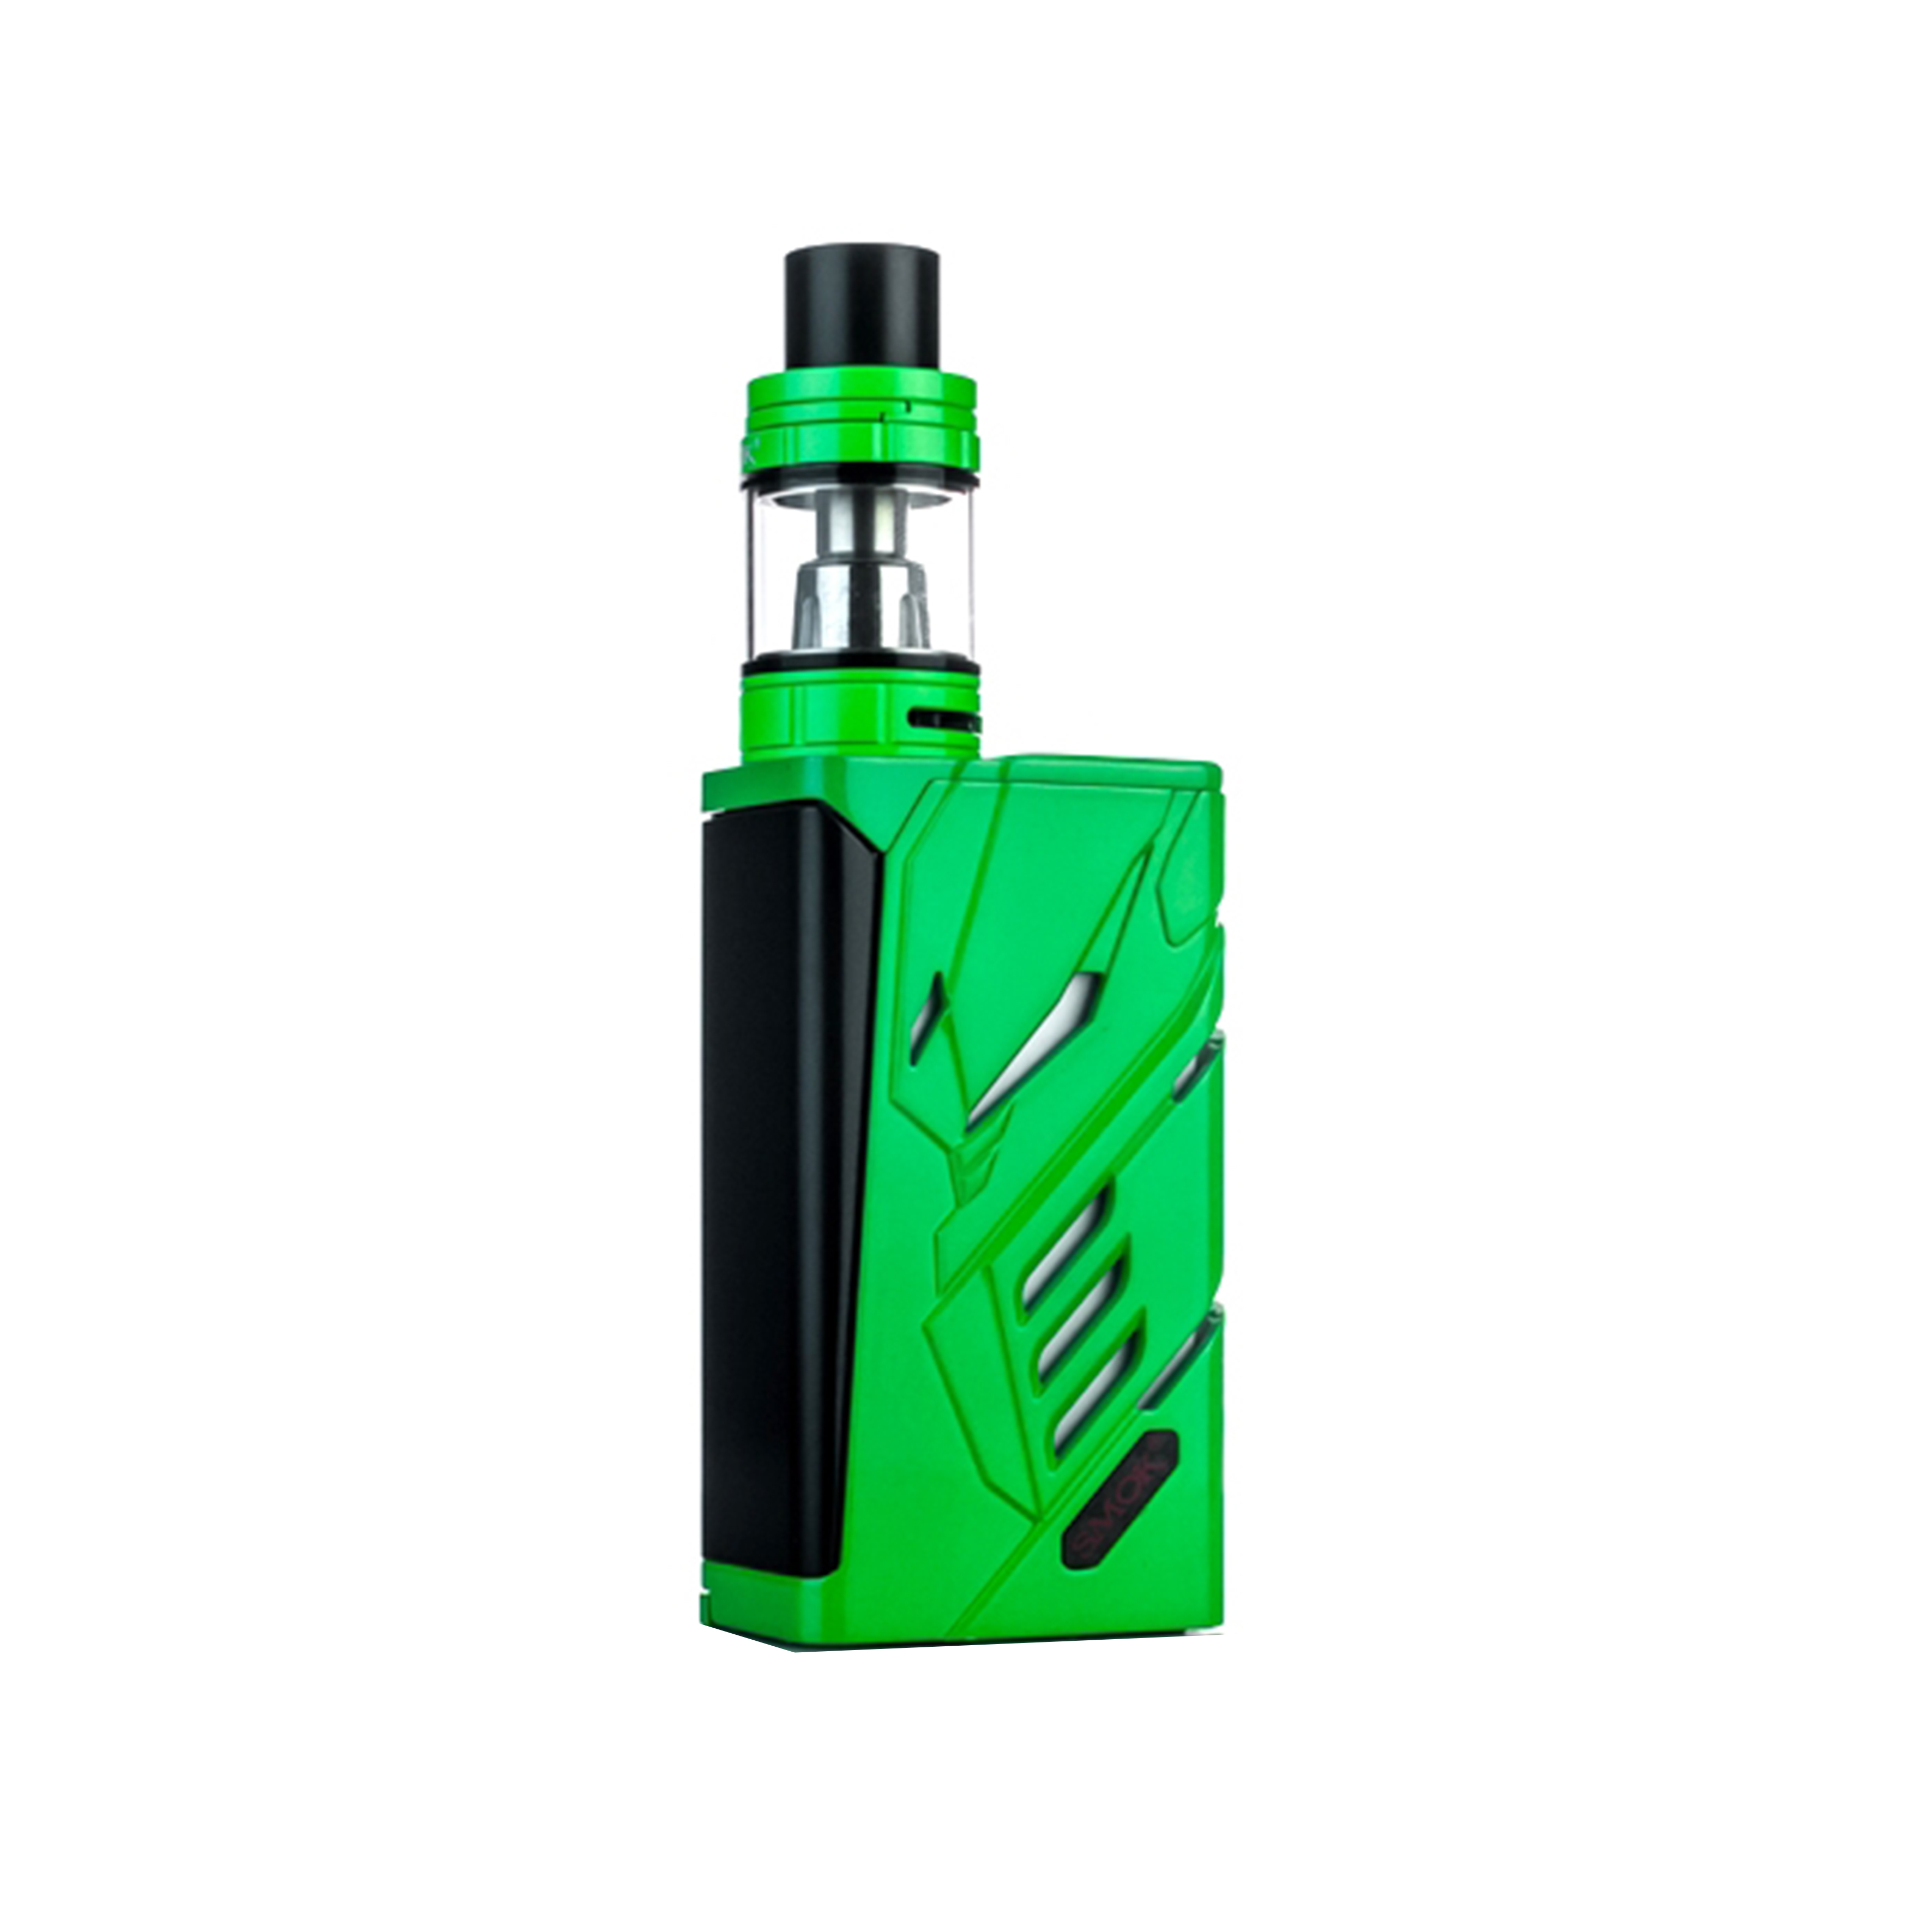 Smok T-Priv Green